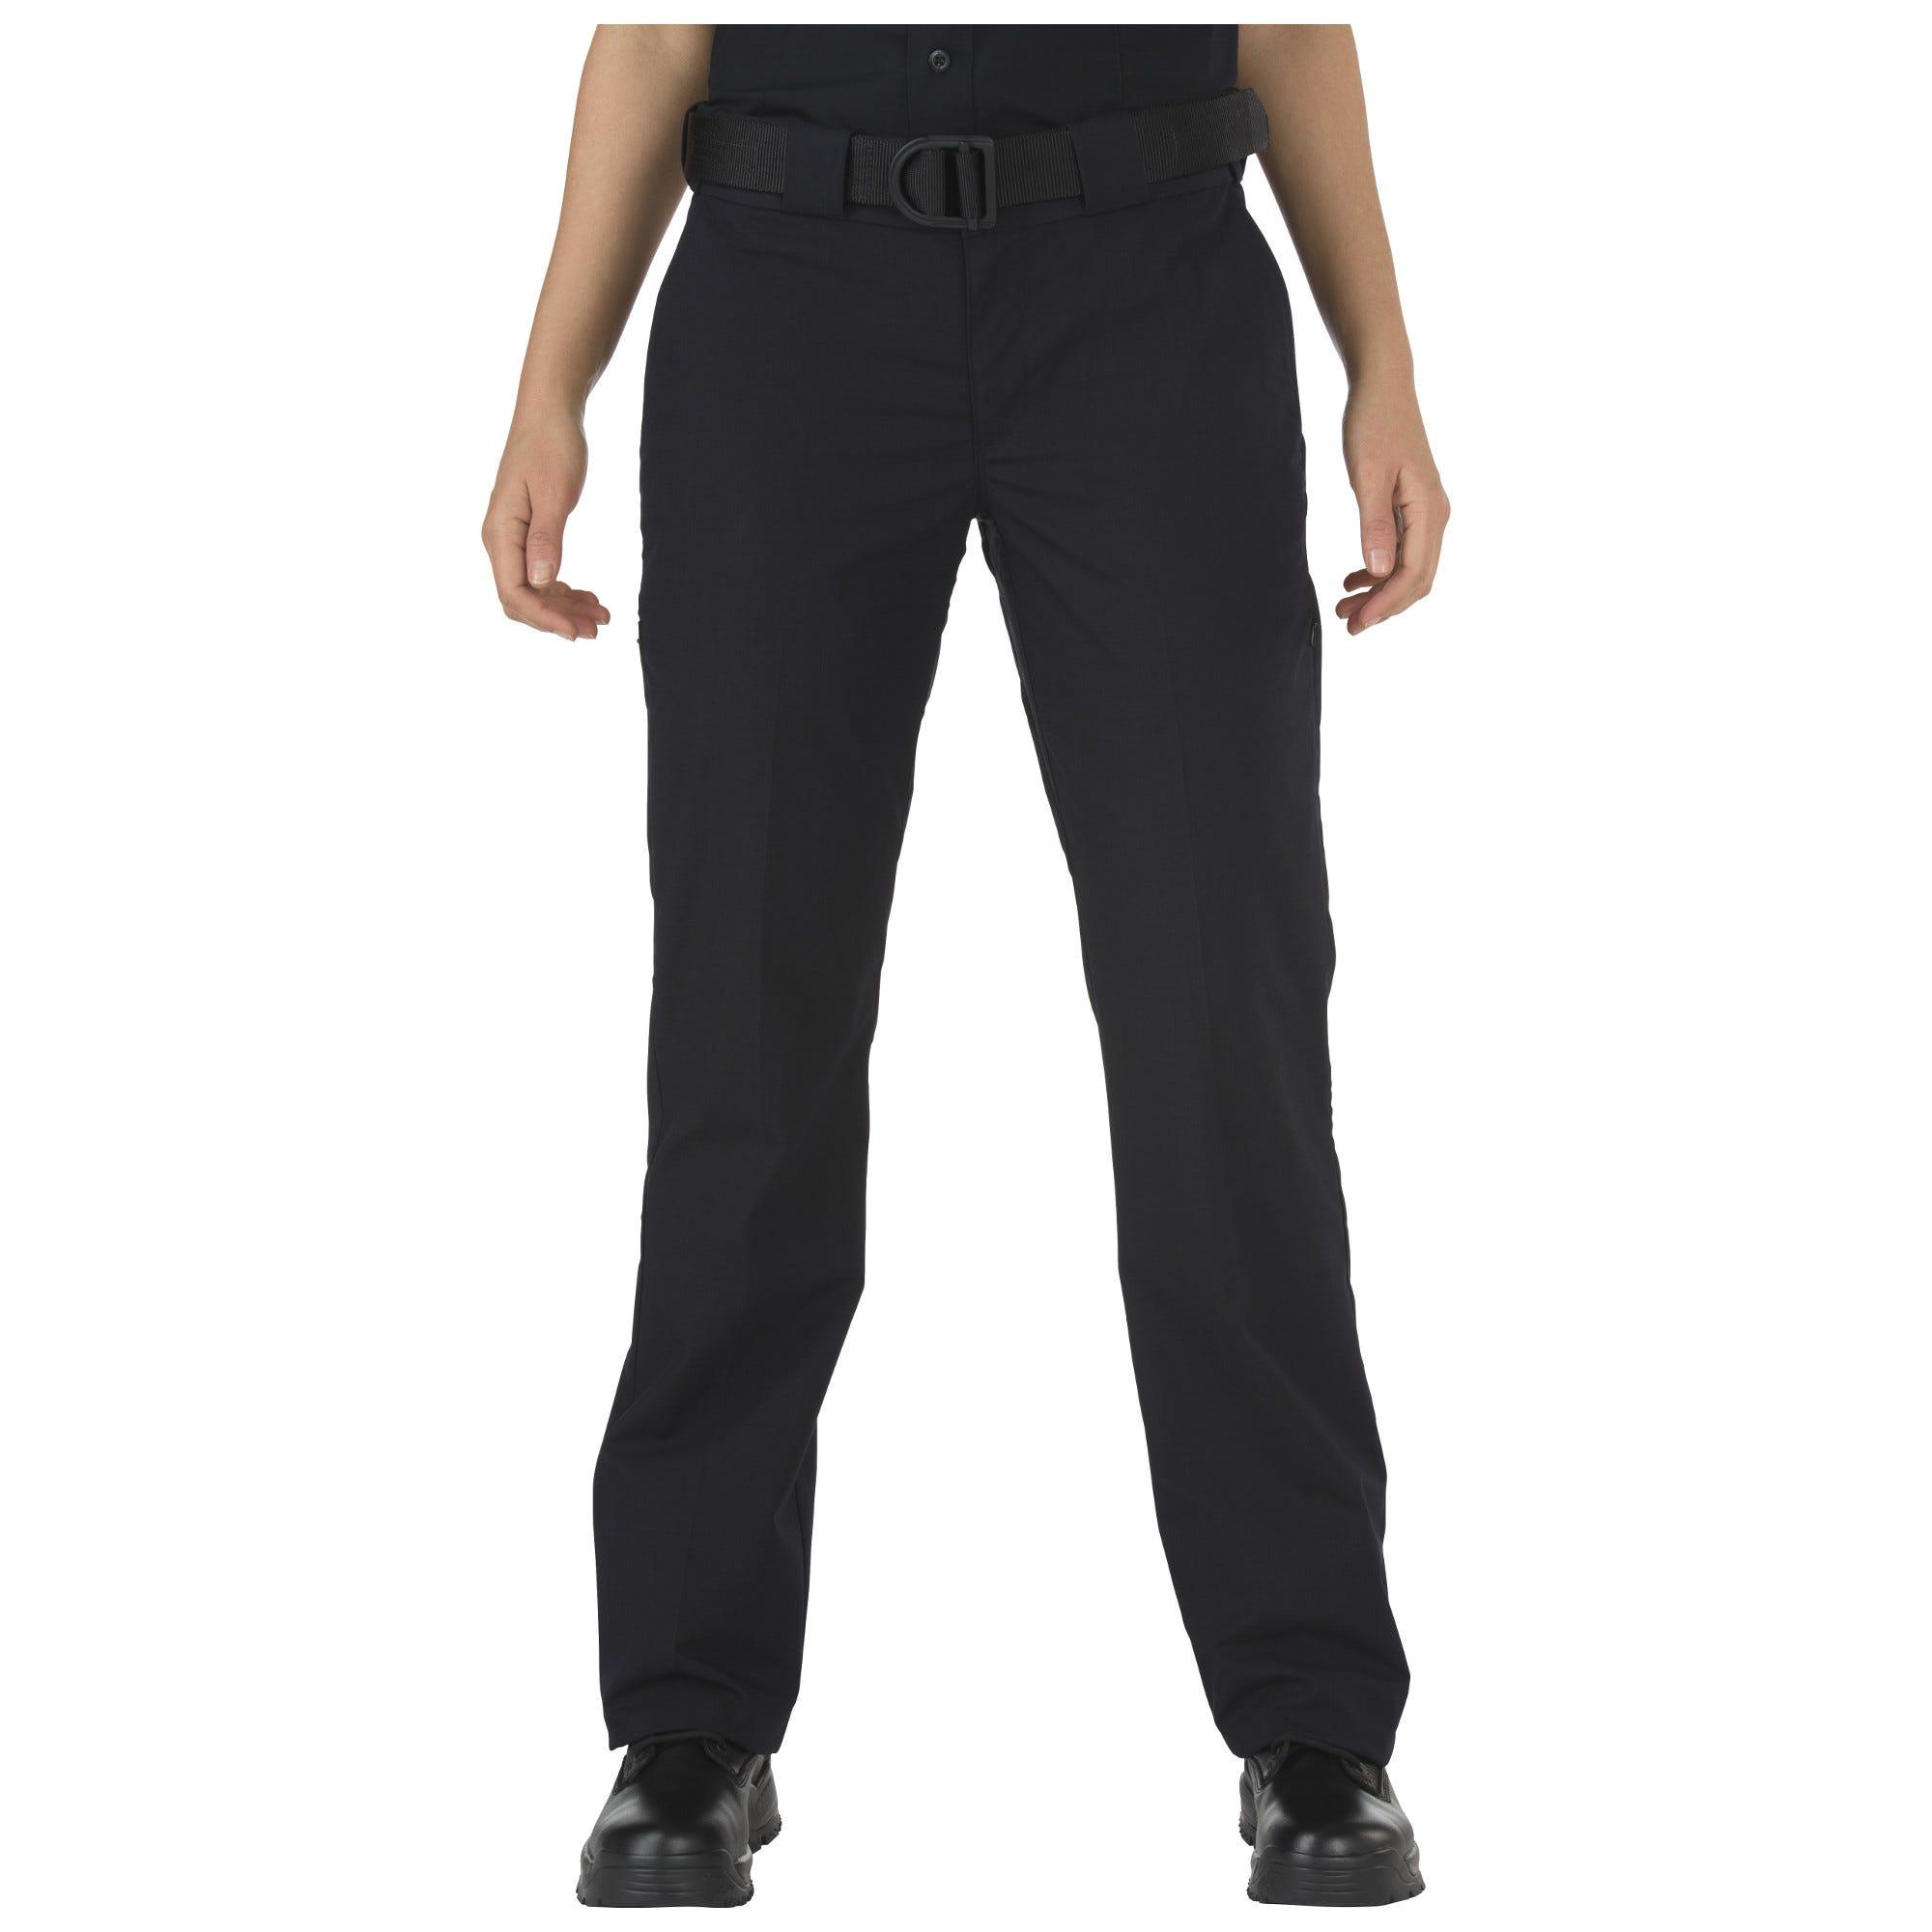 5.11 Tactical Women's 5.11 Stryke™ Class-A PDU® Pant (Blue) thumbnail